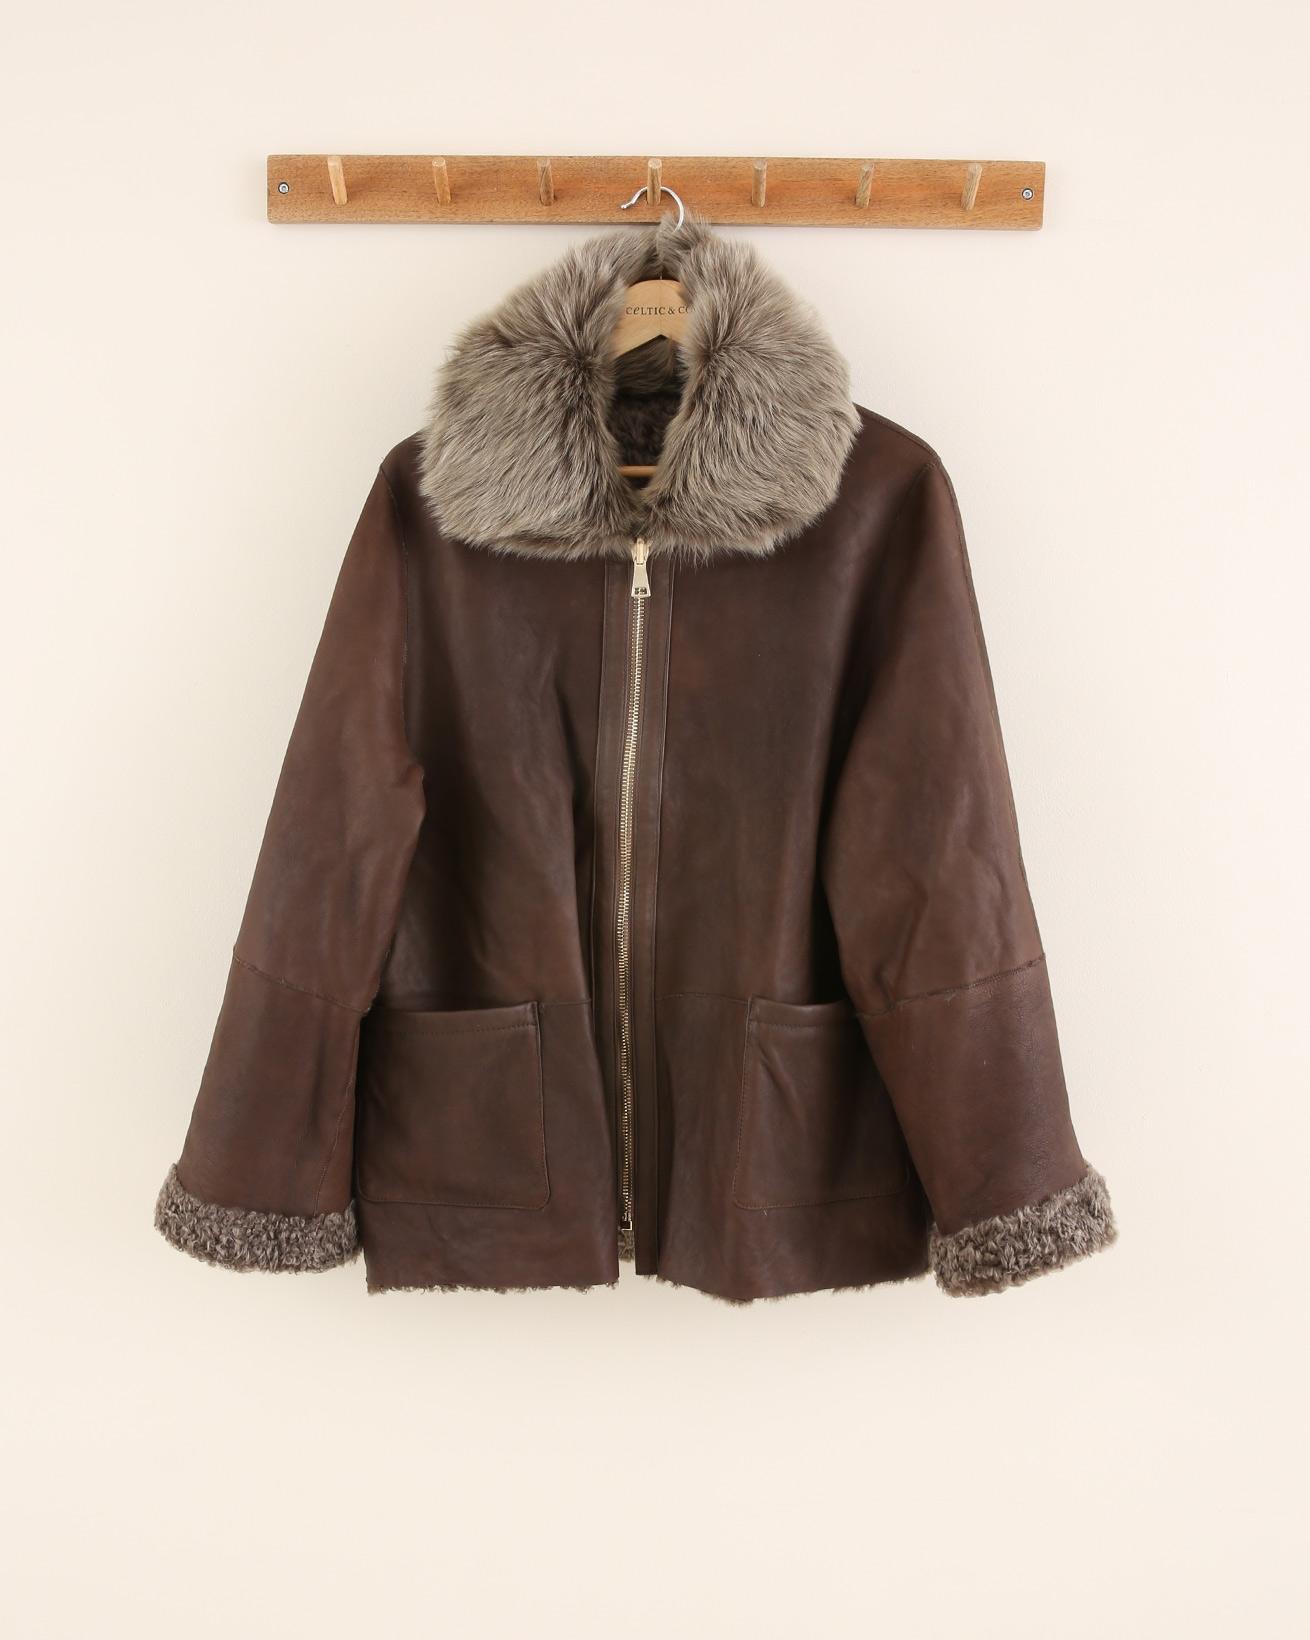 Reversible Sheepskin Swing Jacket - Size 10 - Khaki Brown - 1672